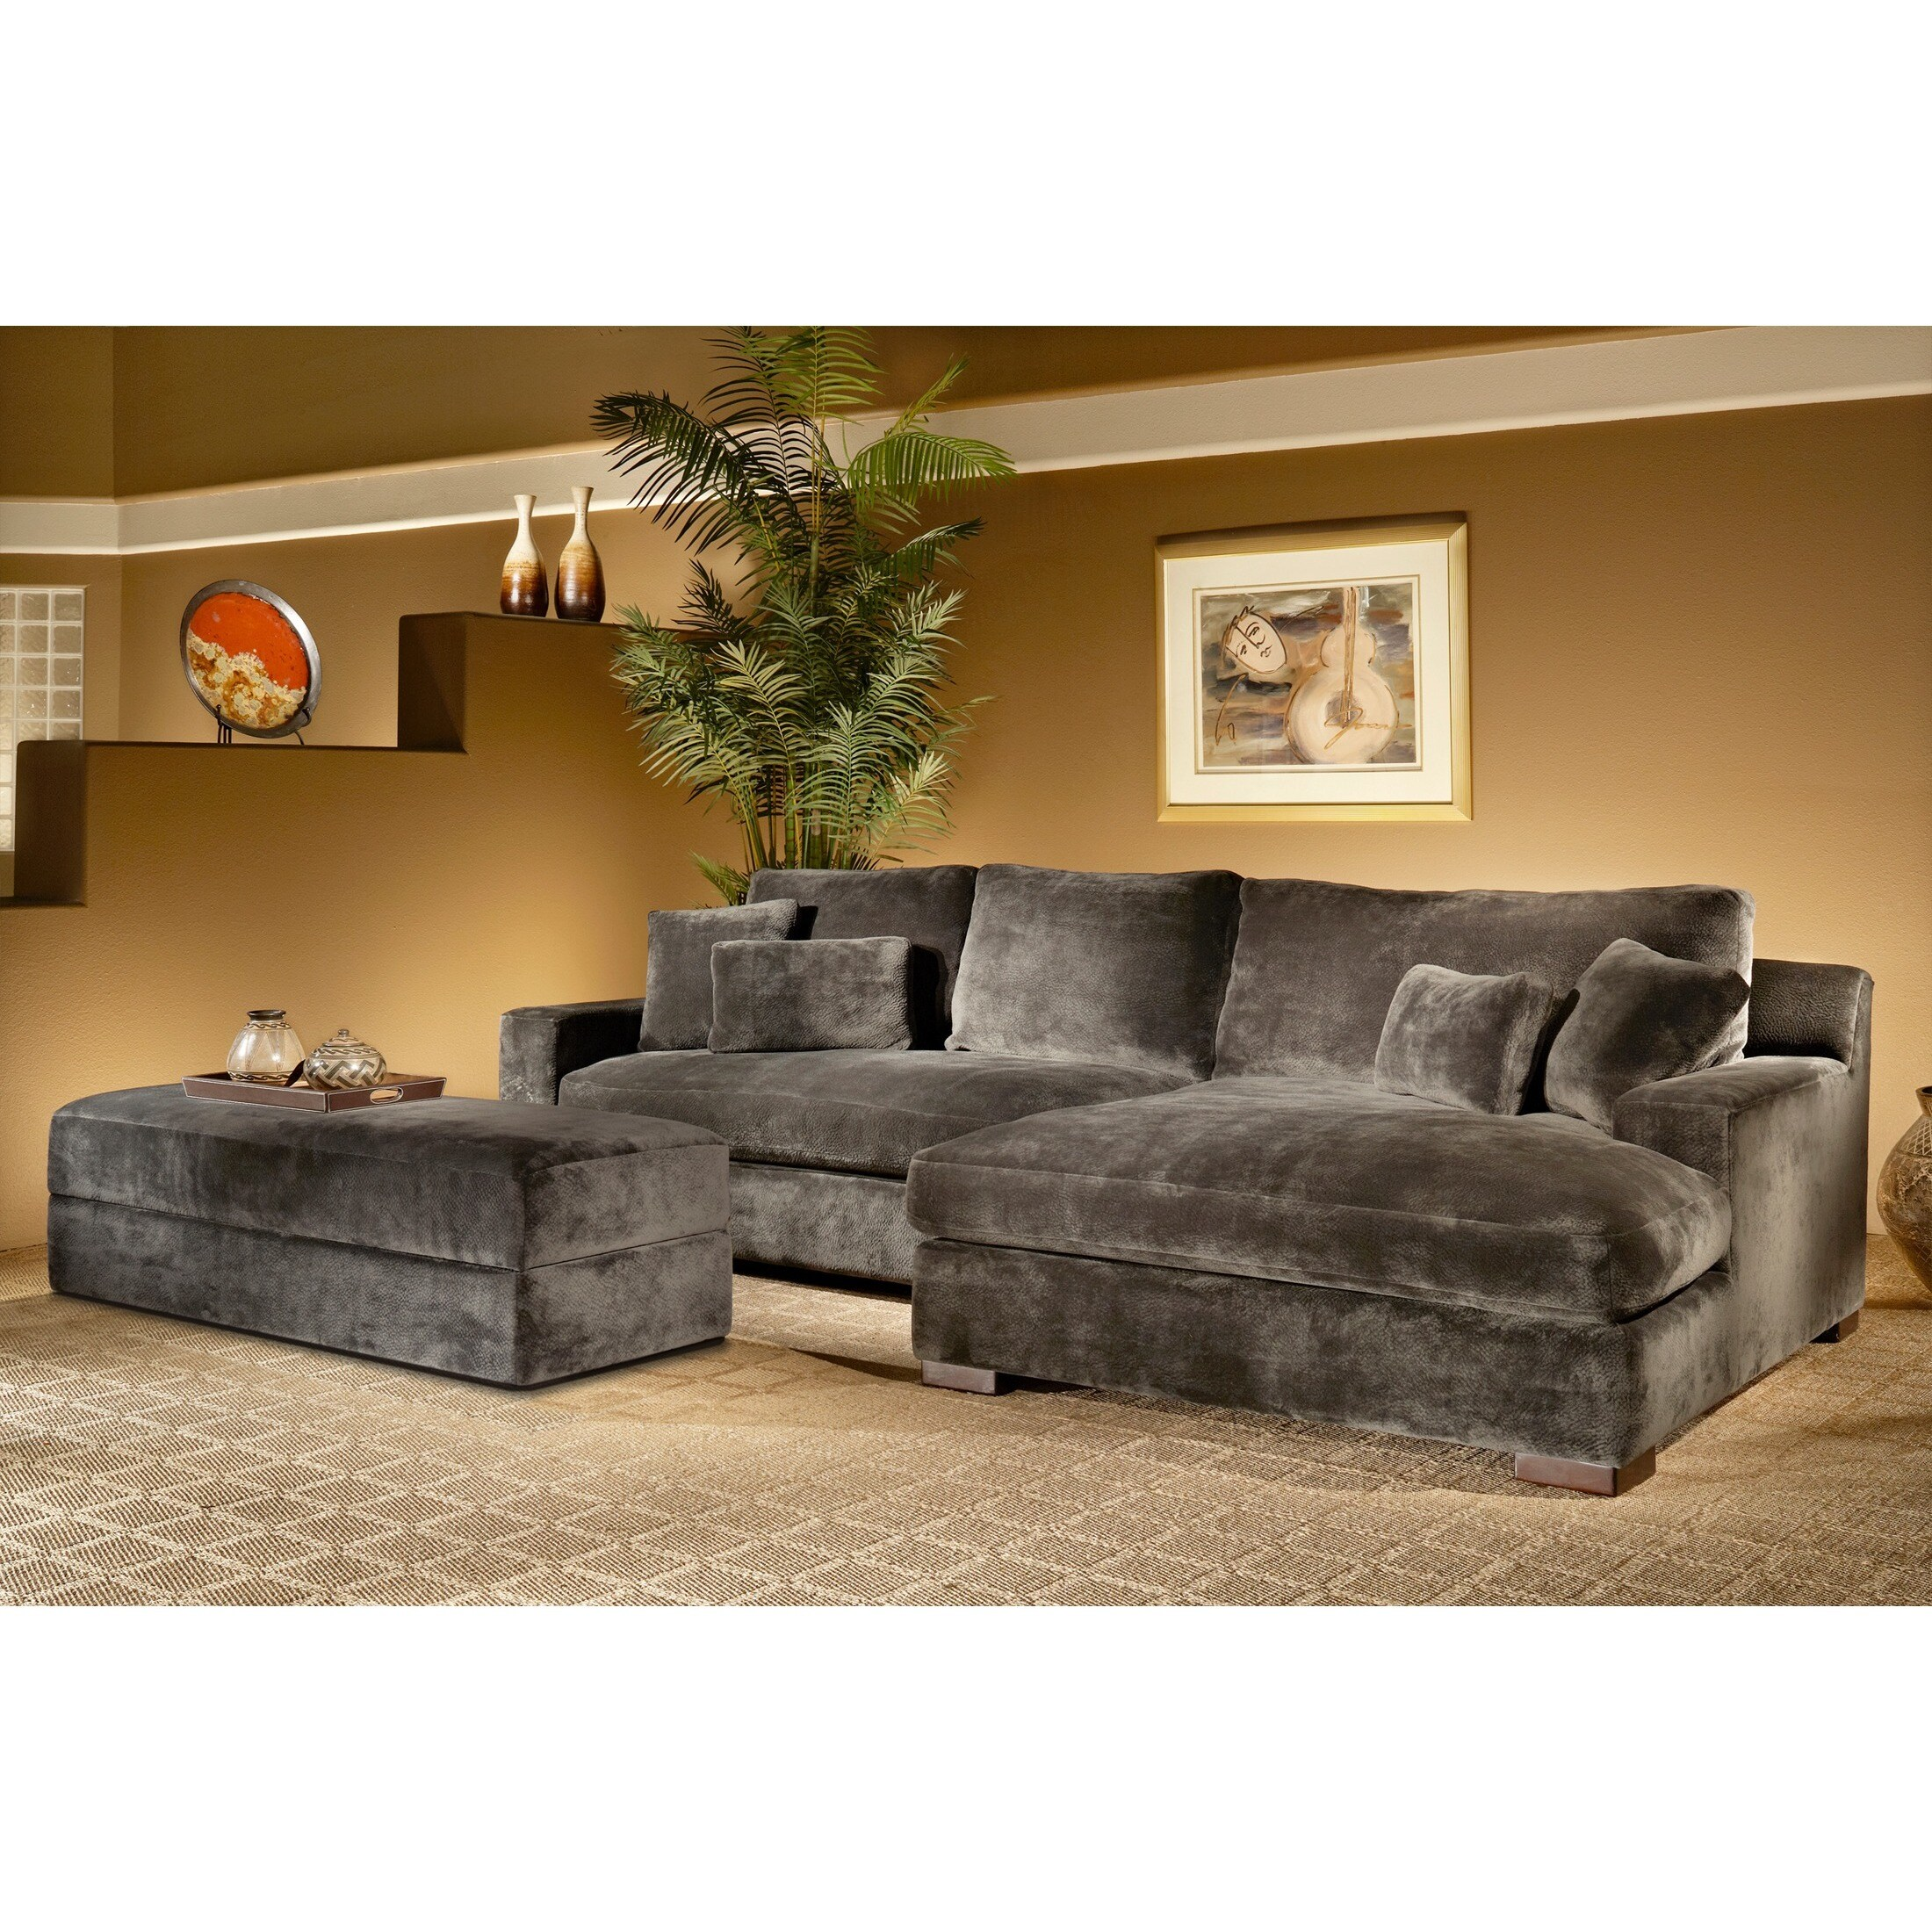 Fairmont Designs Made To Order Doris 3-piece Smoke Sectional Sofa with  Storage Ottoman